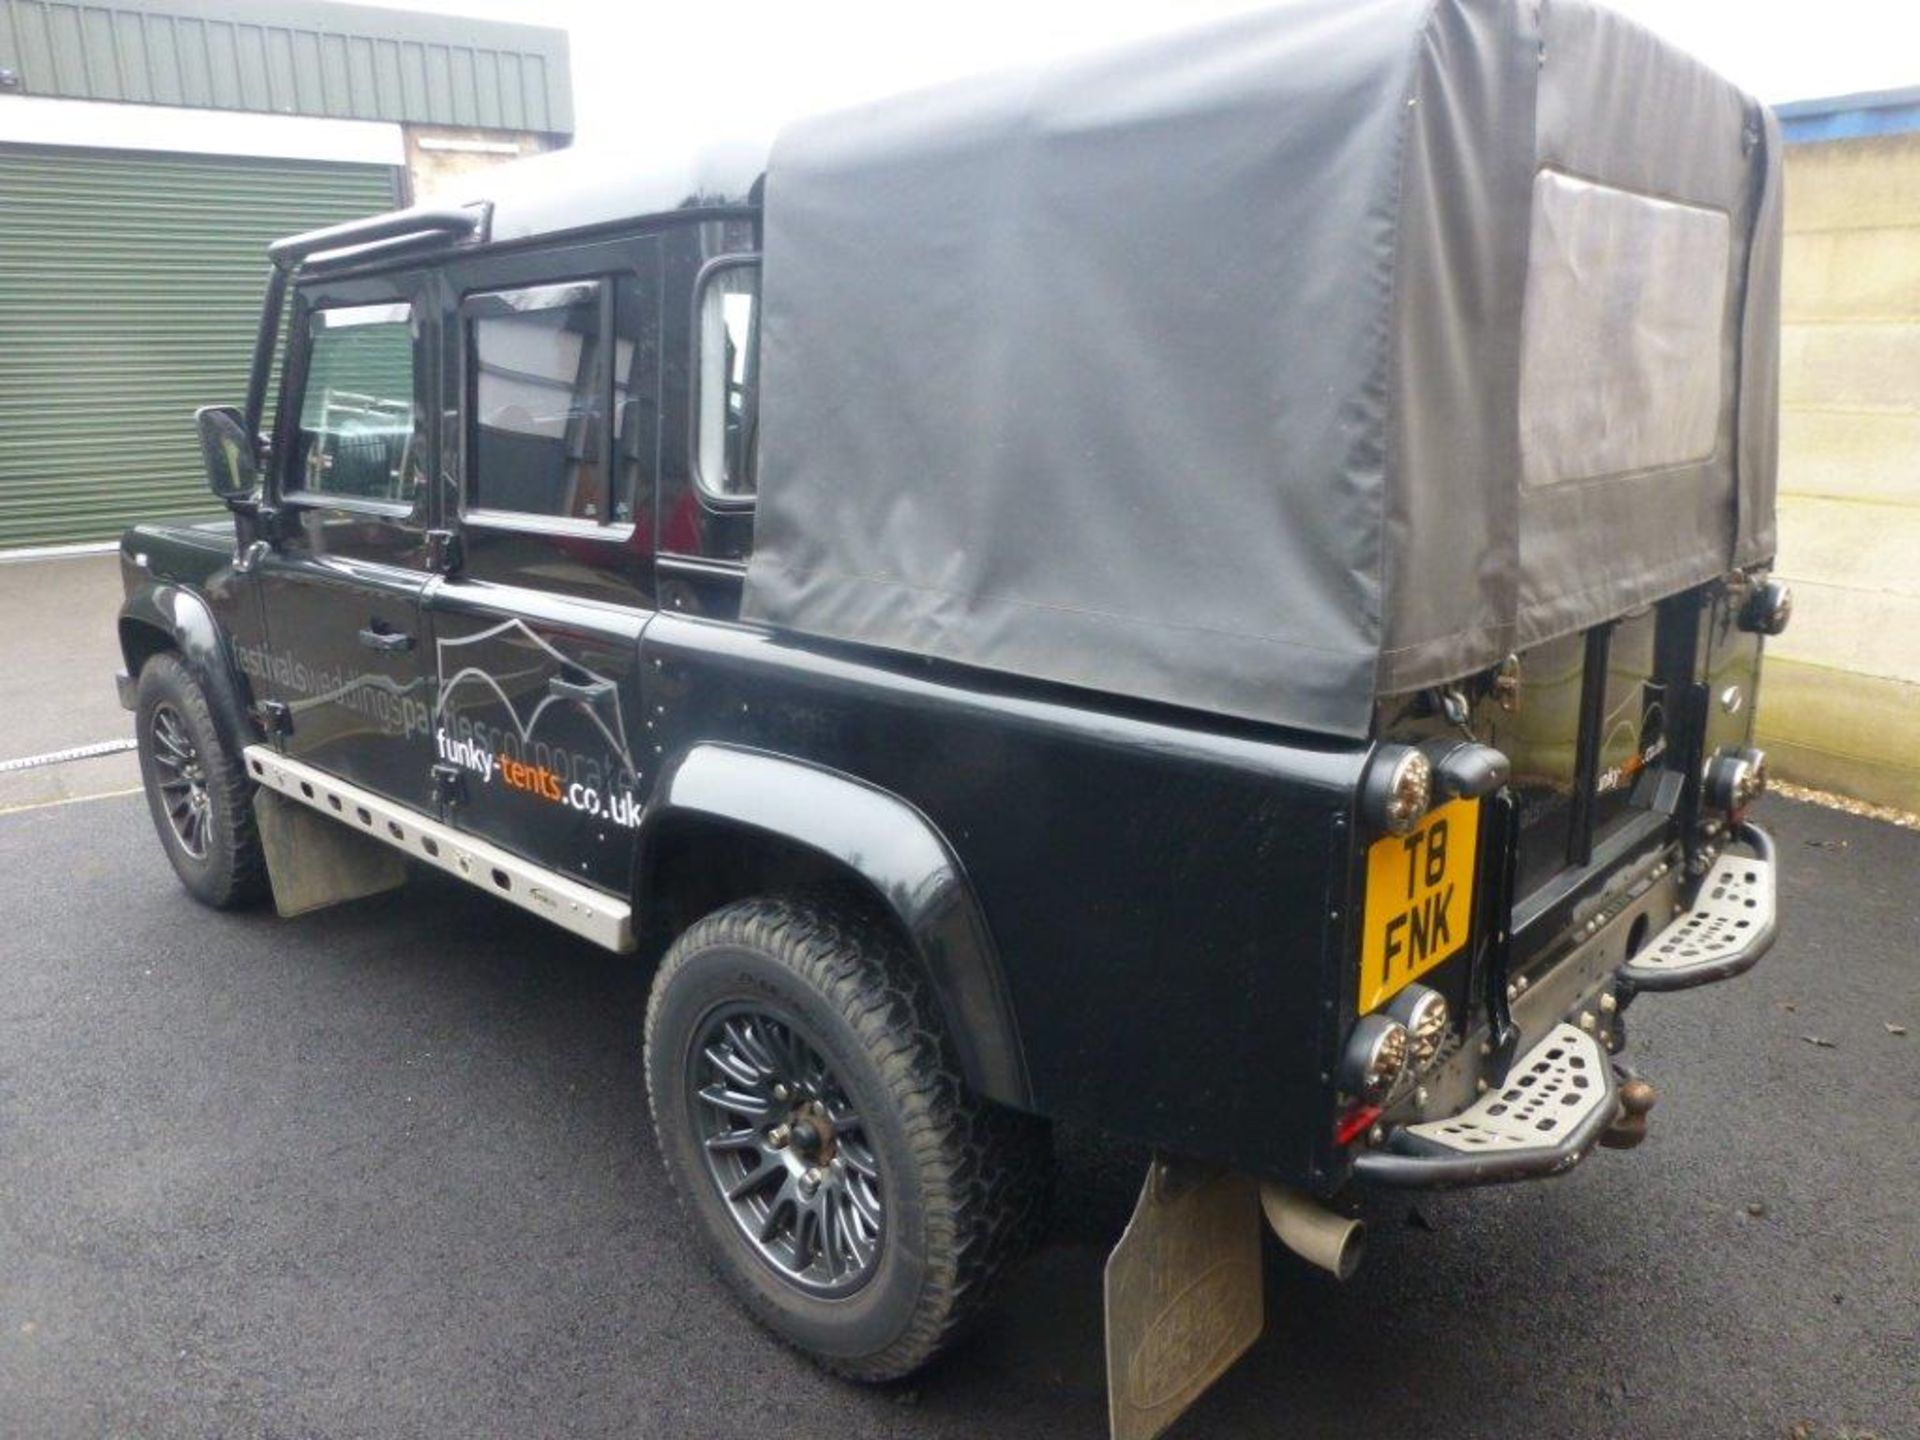 Land Rover Defender 110 XS Bowler double cab pickup TDCi (2.2). Reg no. FN15 LBK. Reg. date 23/03/ - Image 5 of 12